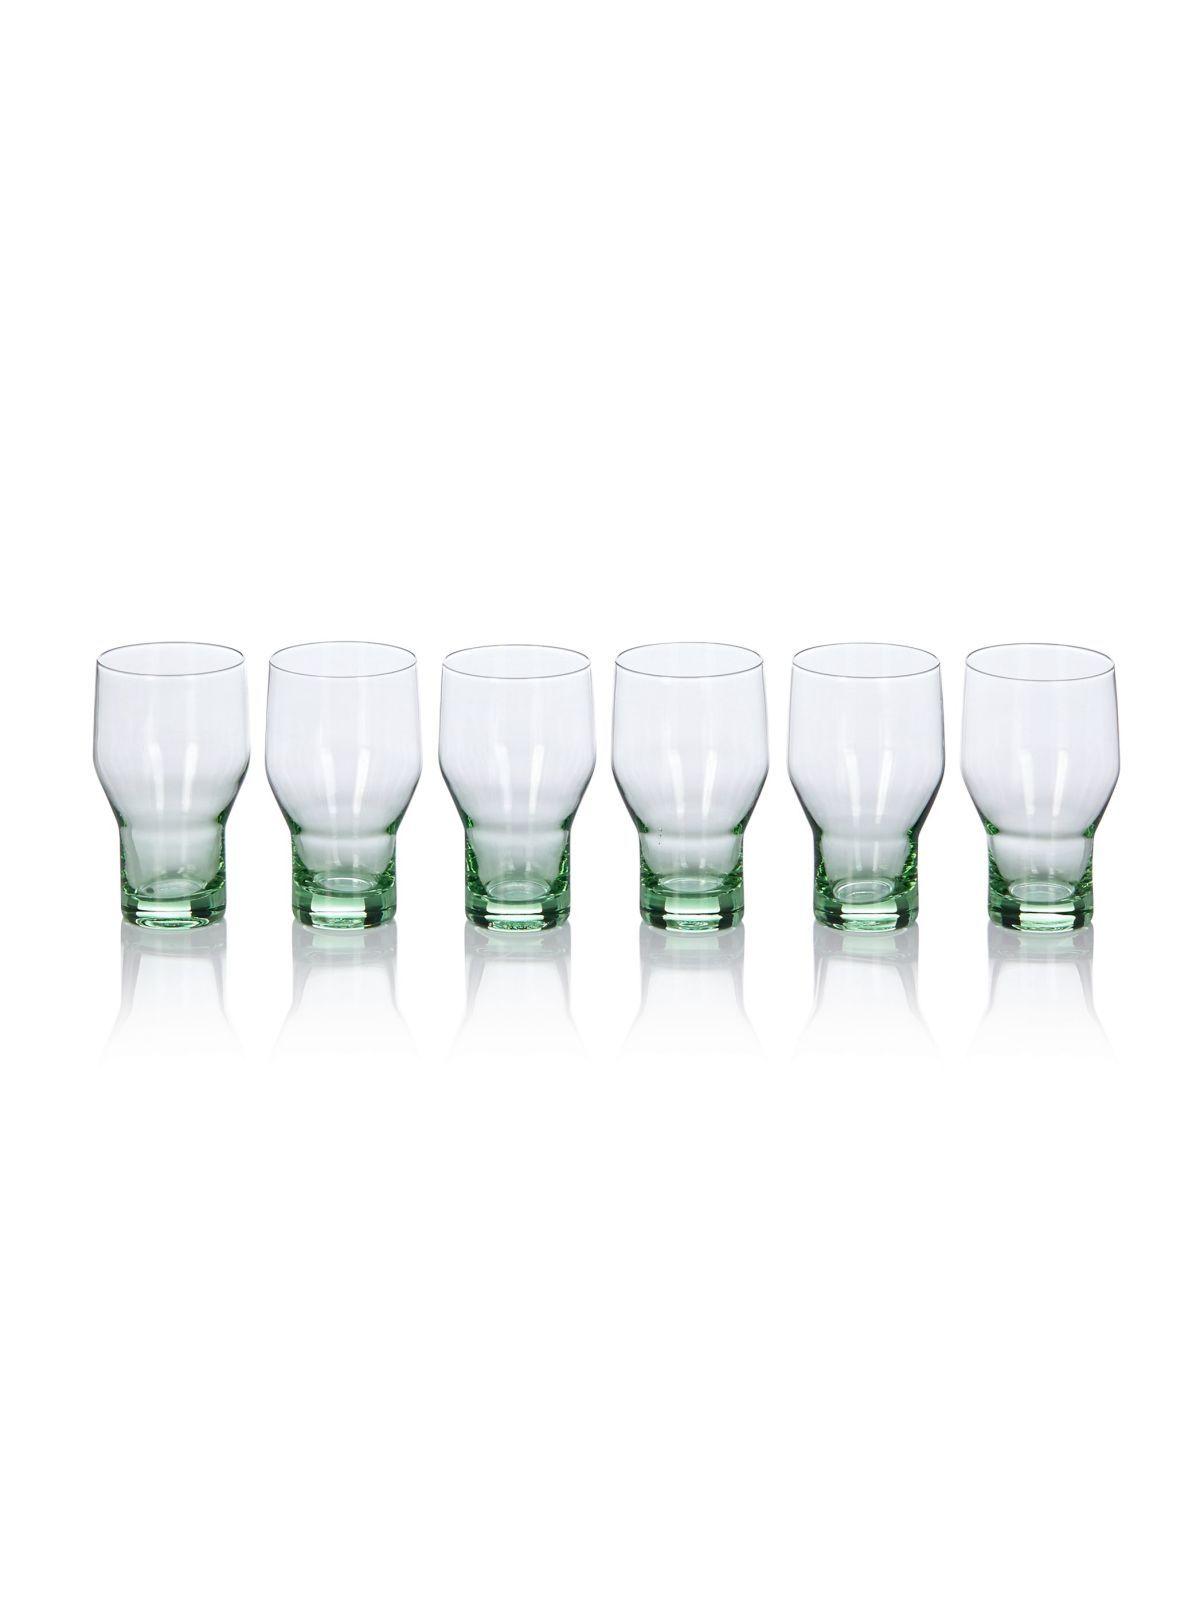 Impressionen De inspiration küche impressionen living wasserglas set 6 tlg